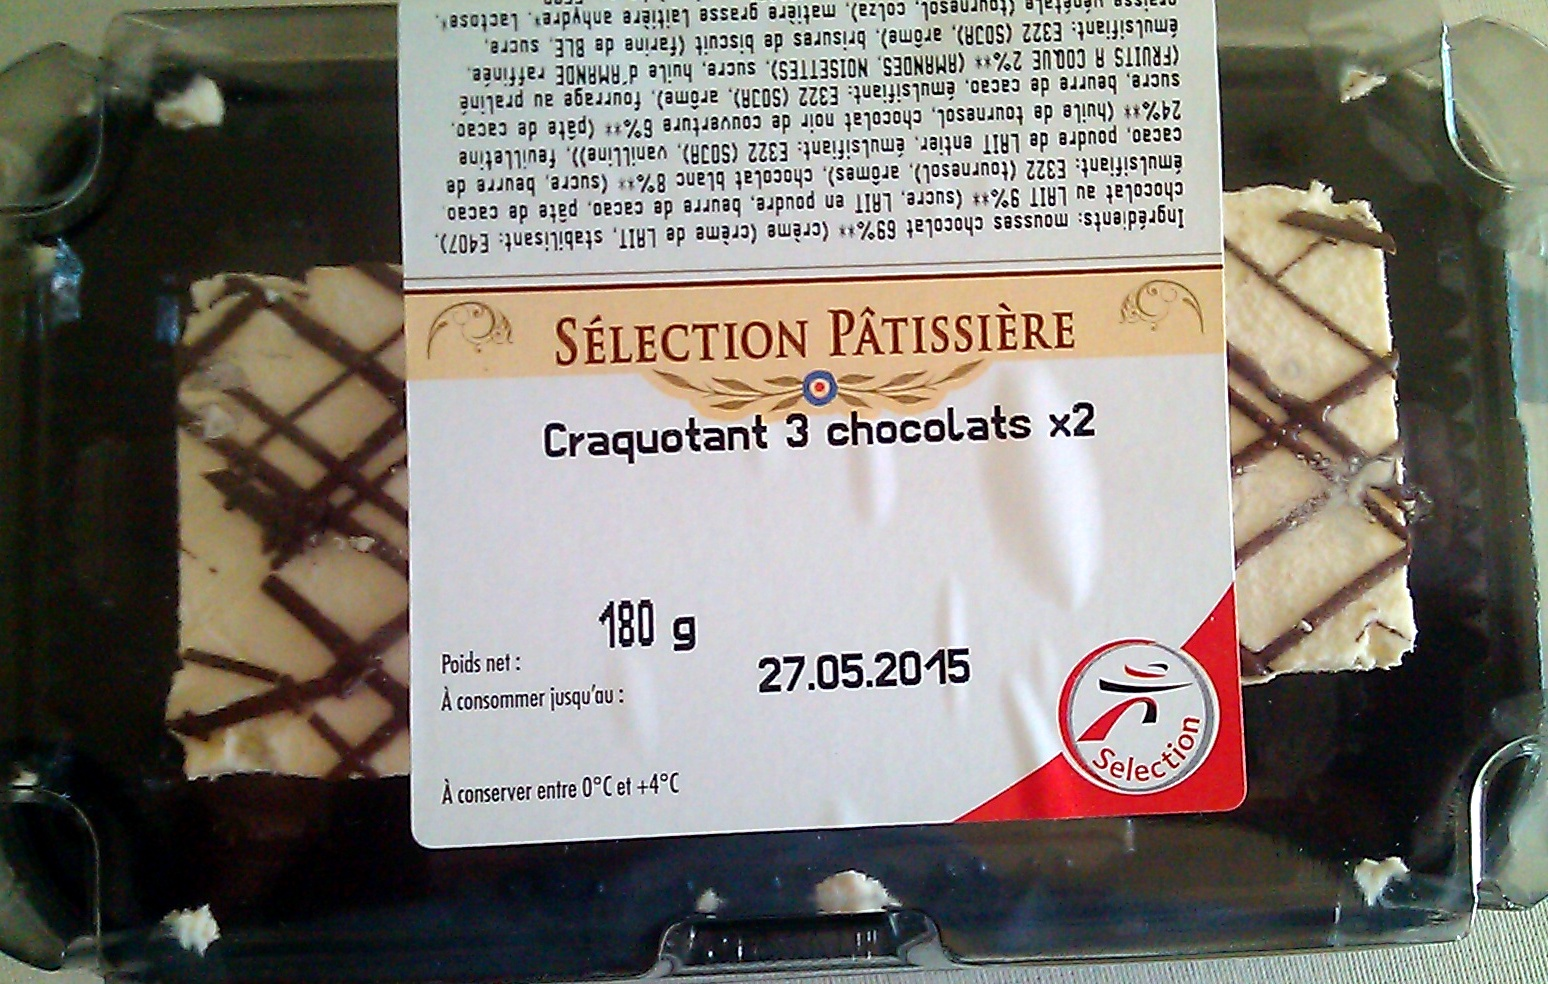 Craquotant 3 chocolats x2 - Product